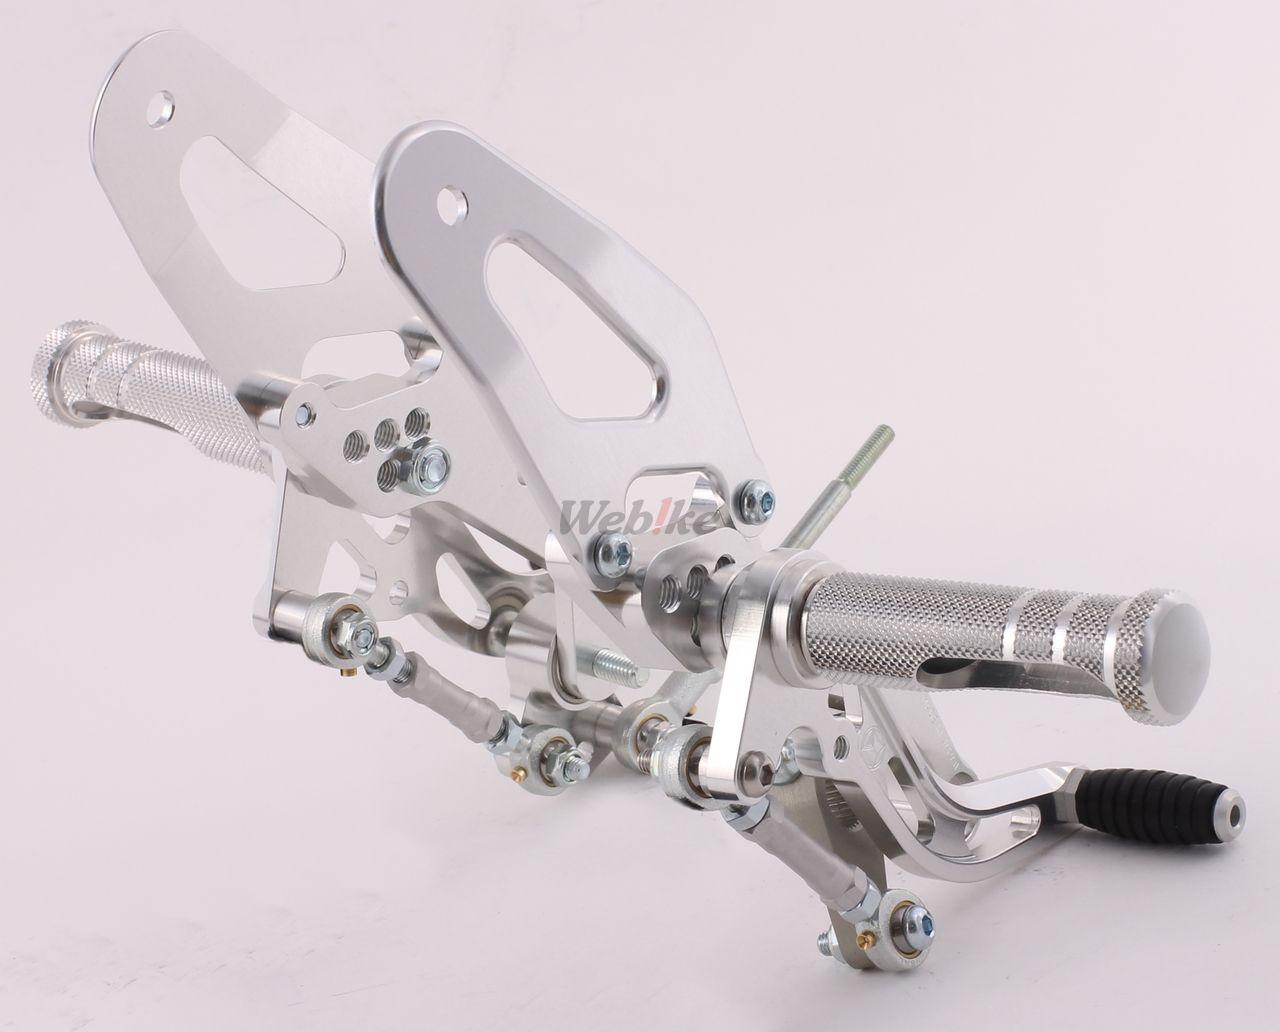 【MORIWAKI】腳踏後移套件 - 「Webike-摩托百貨」